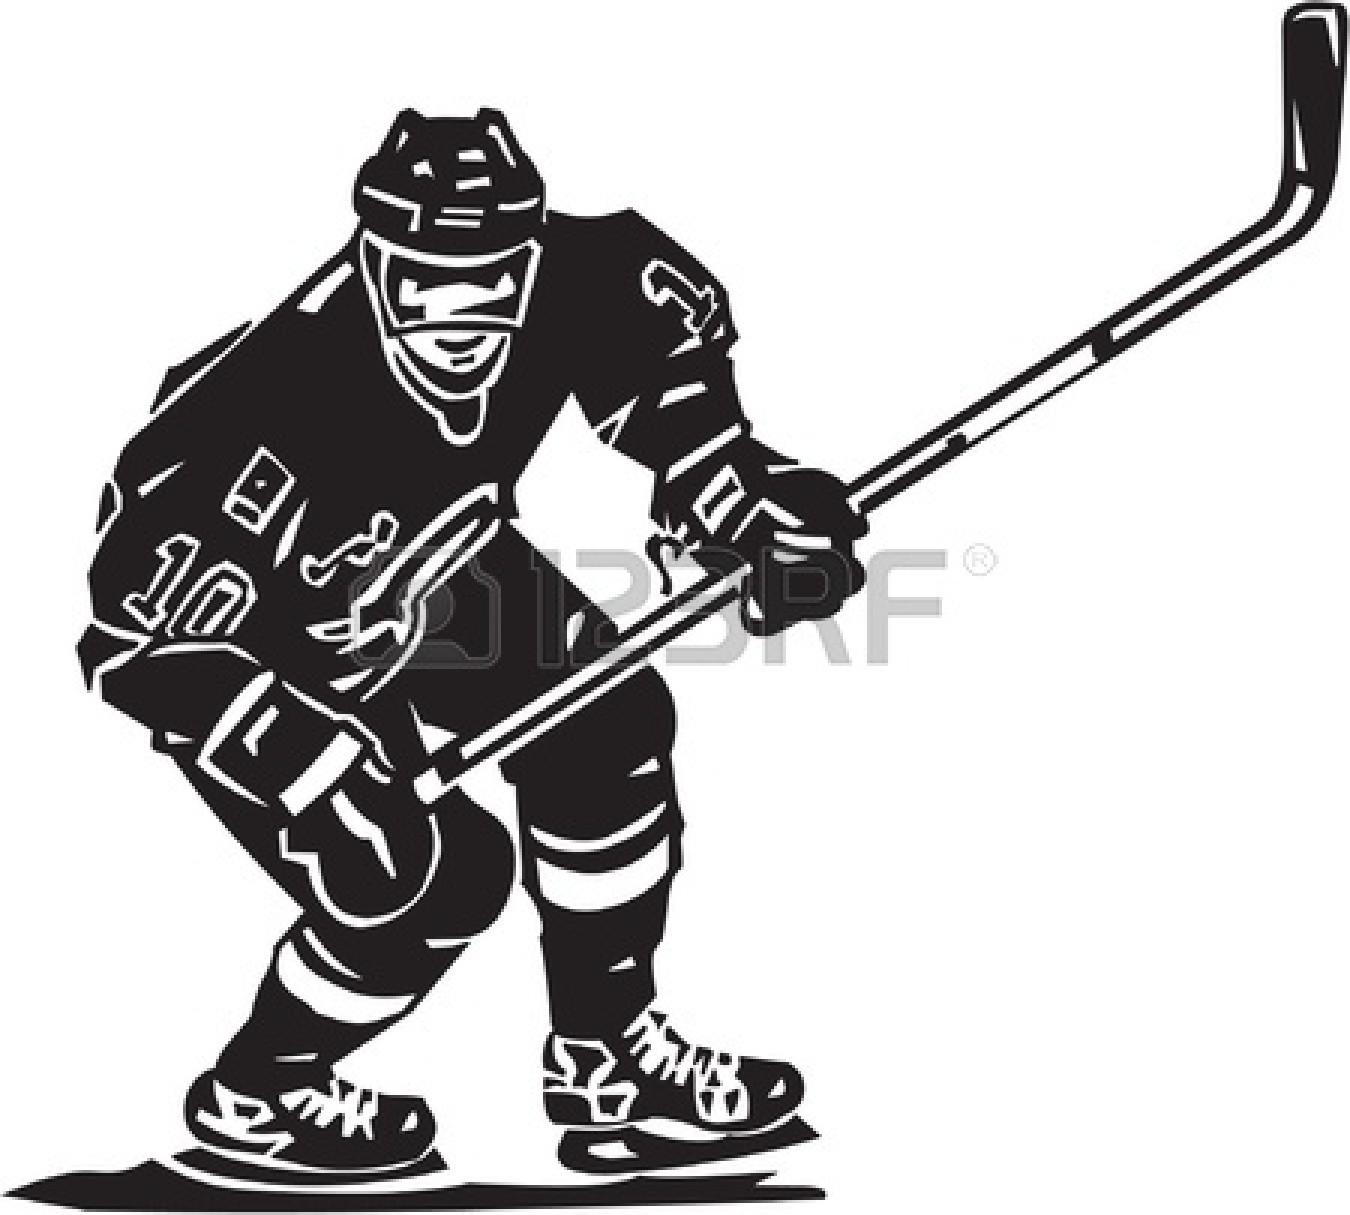 Hockey Stick Clipart Black And White Cli-Hockey Stick Clipart Black And White Clipart Panda Free Clipart-11